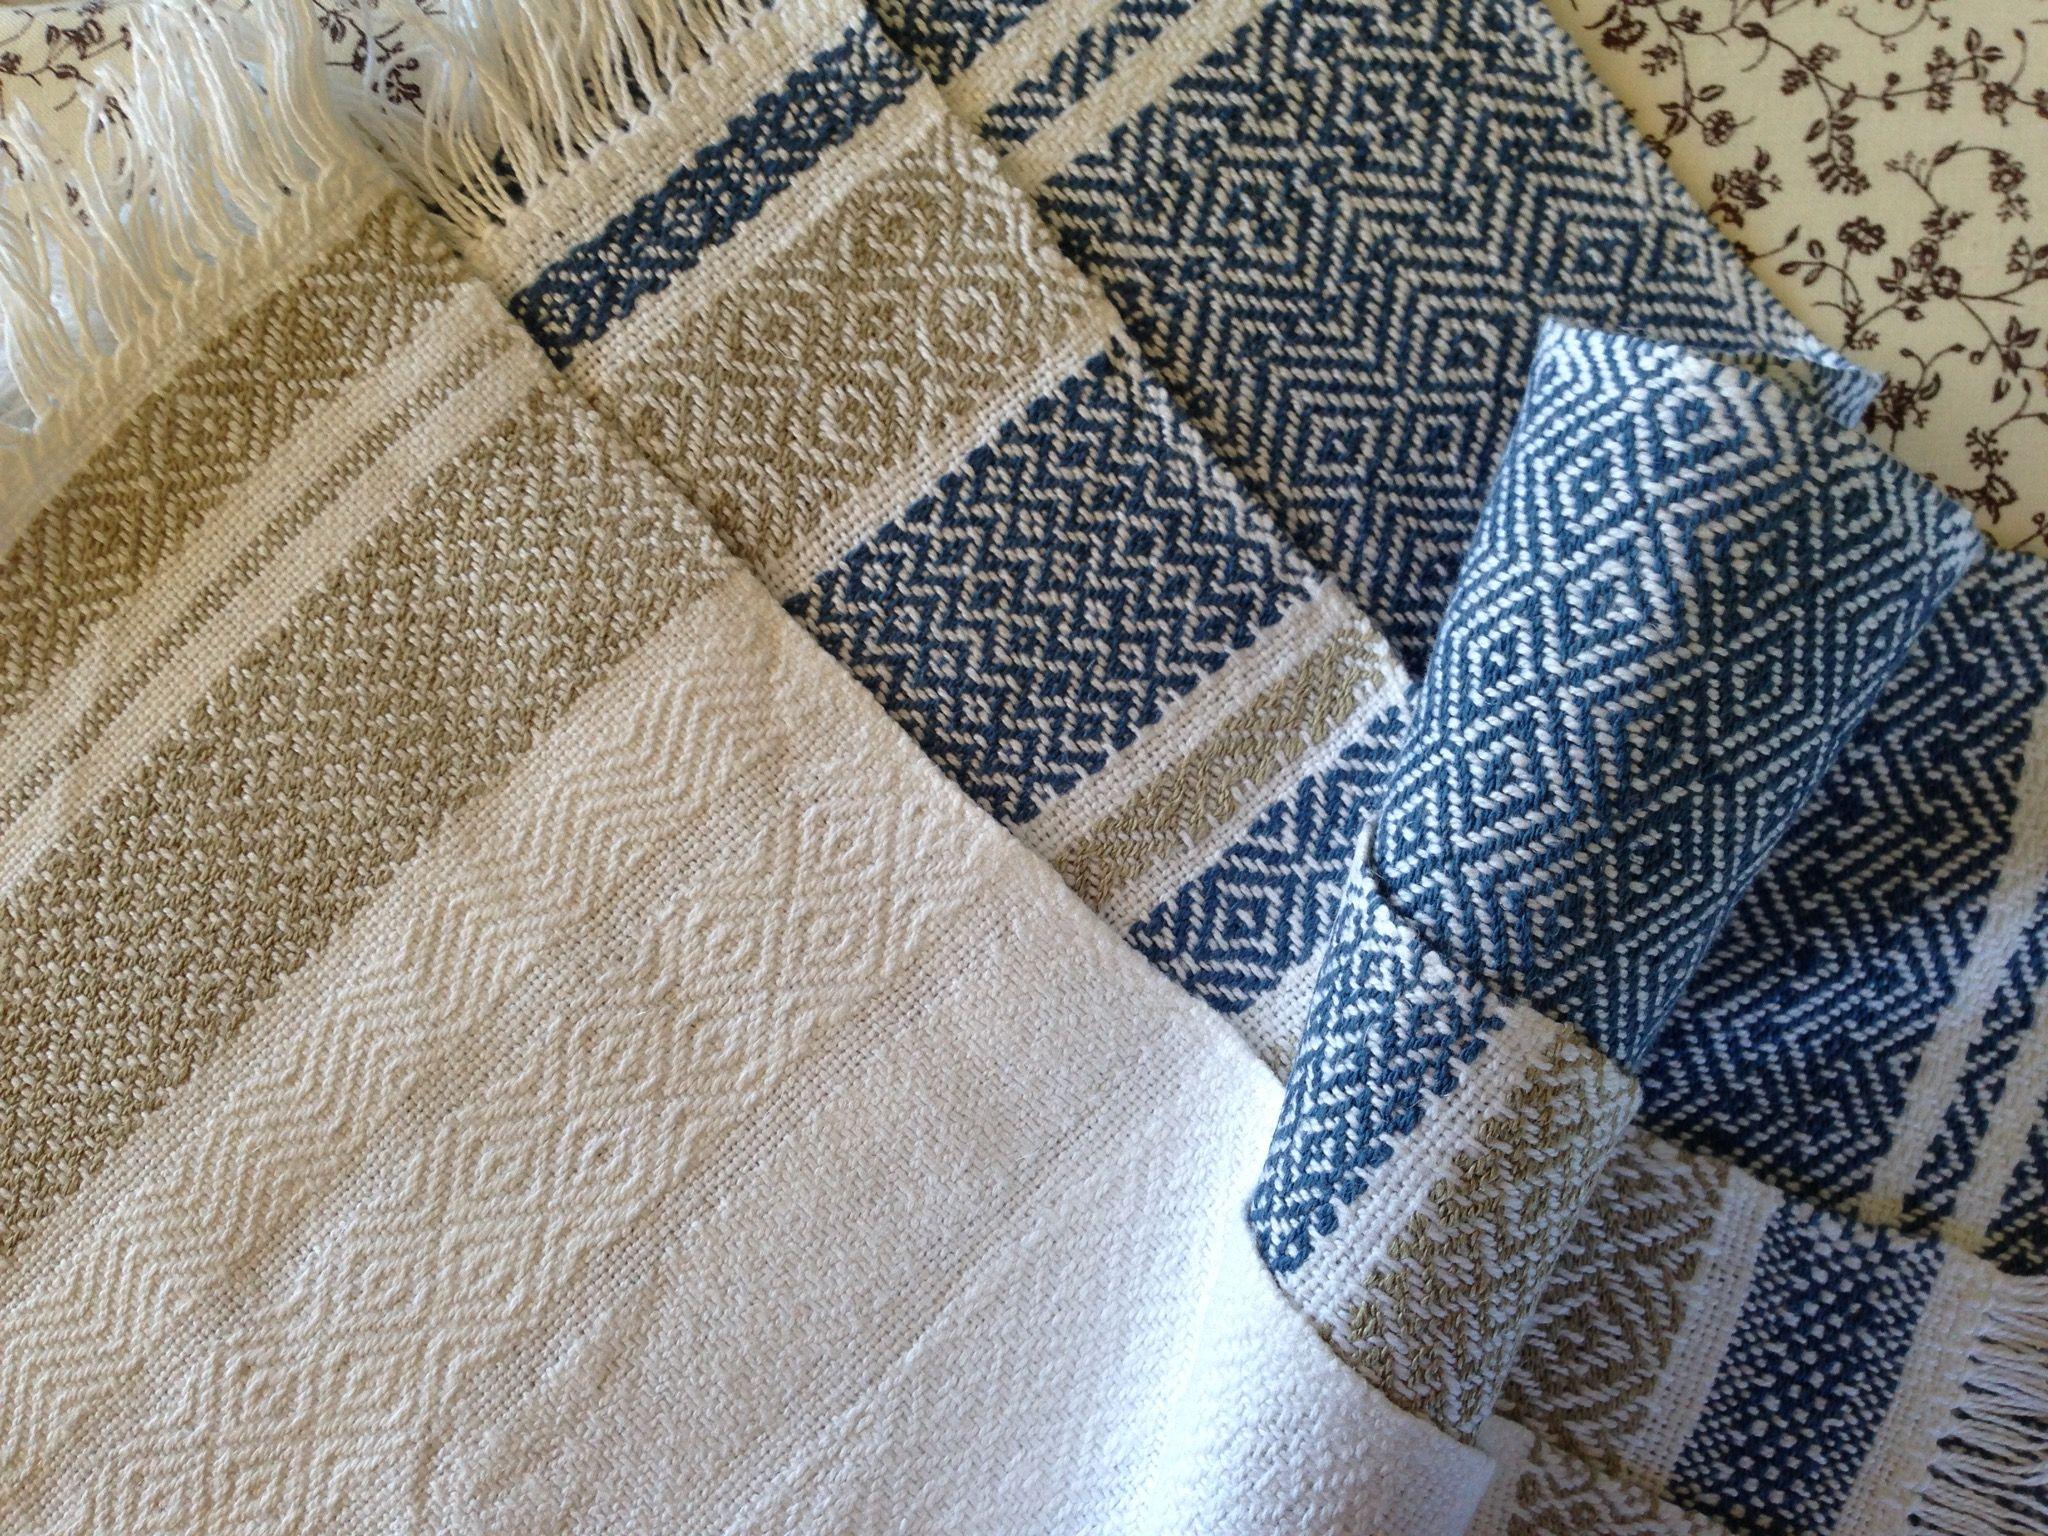 handwoven tea towels - Google Search